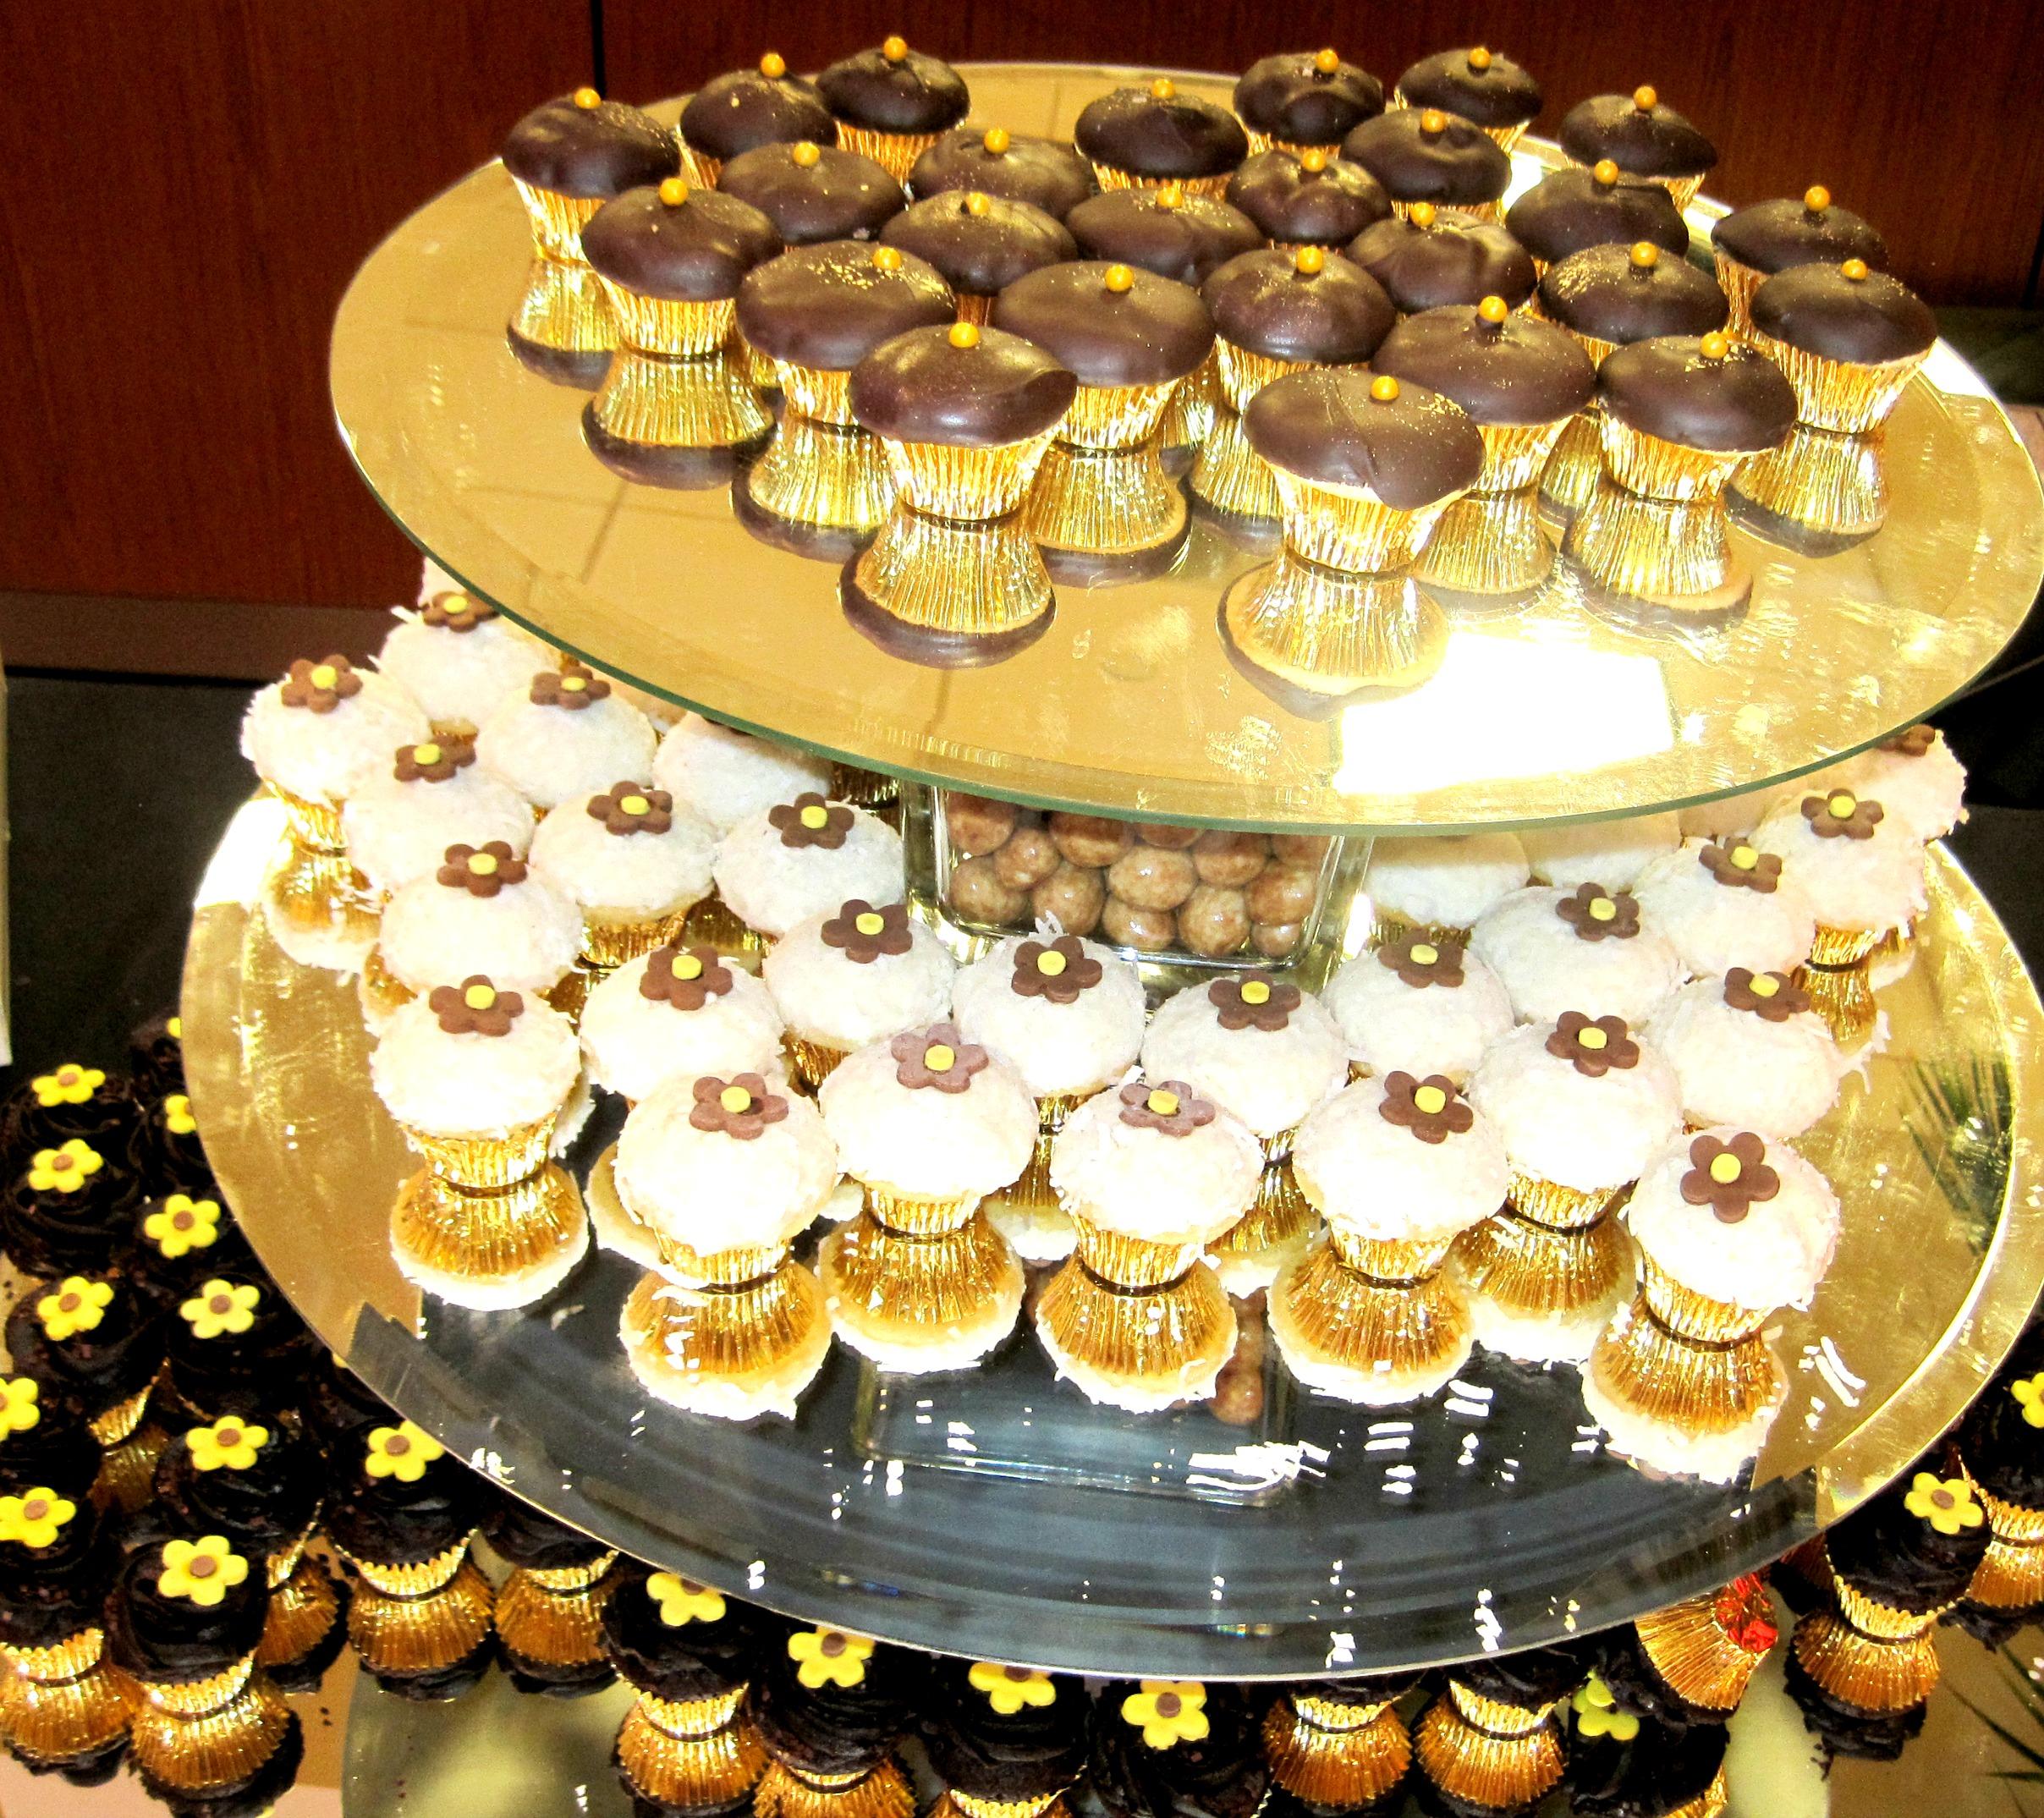 OCrestaurantweek_cupcakes